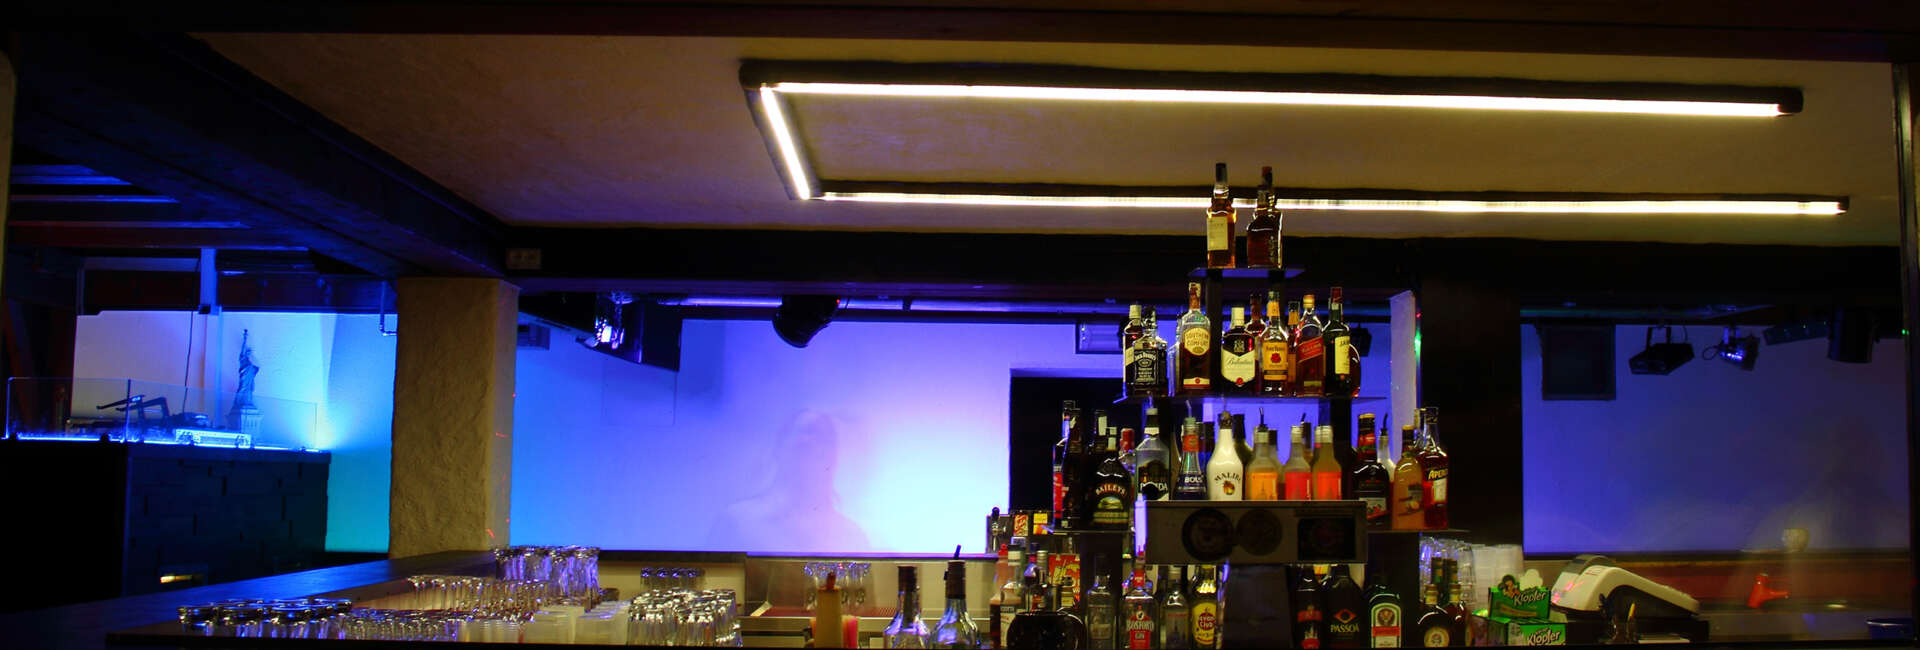 disco-lounge-02